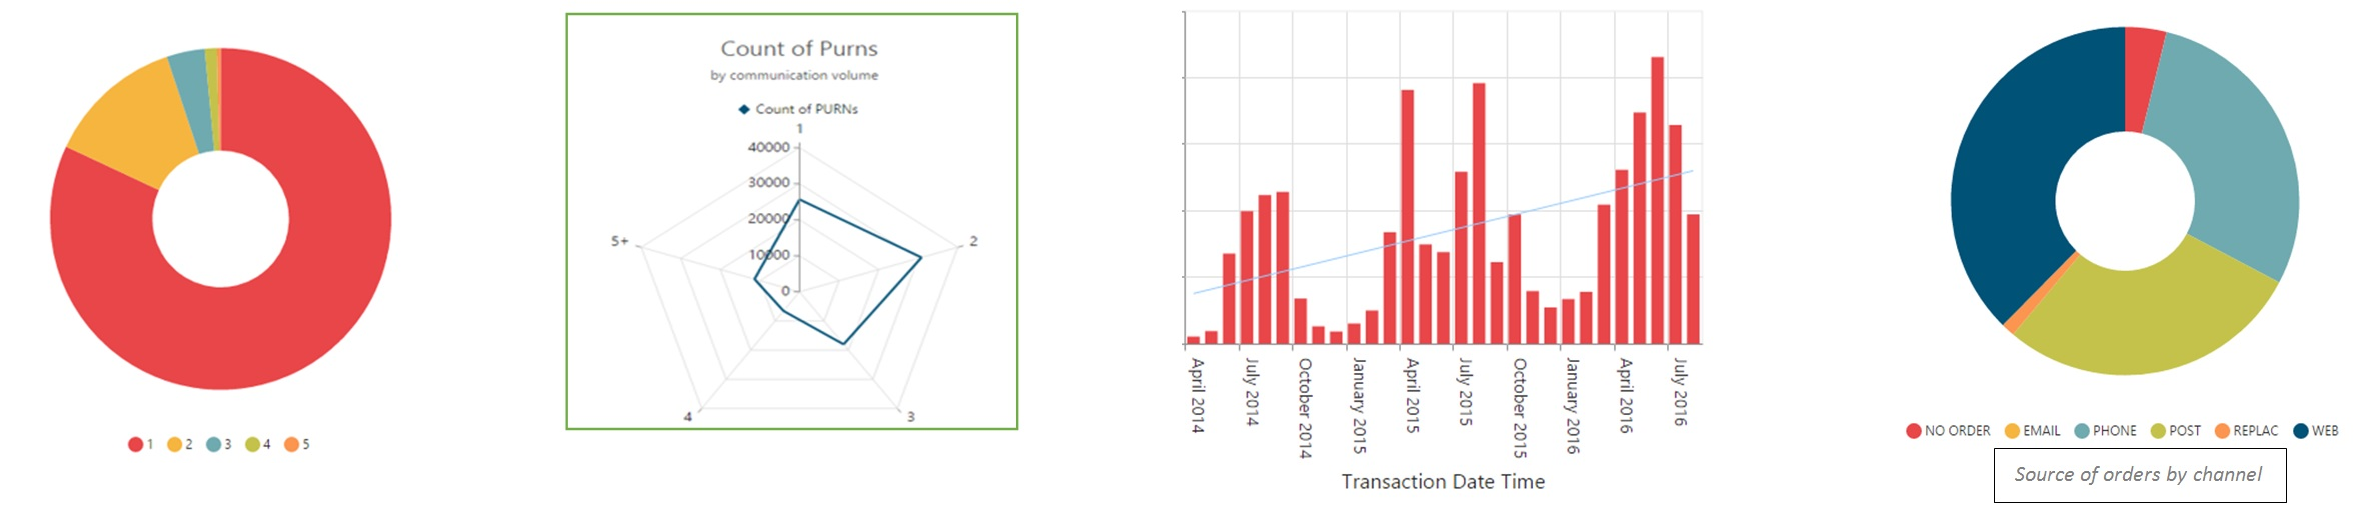 data from a customer data platform